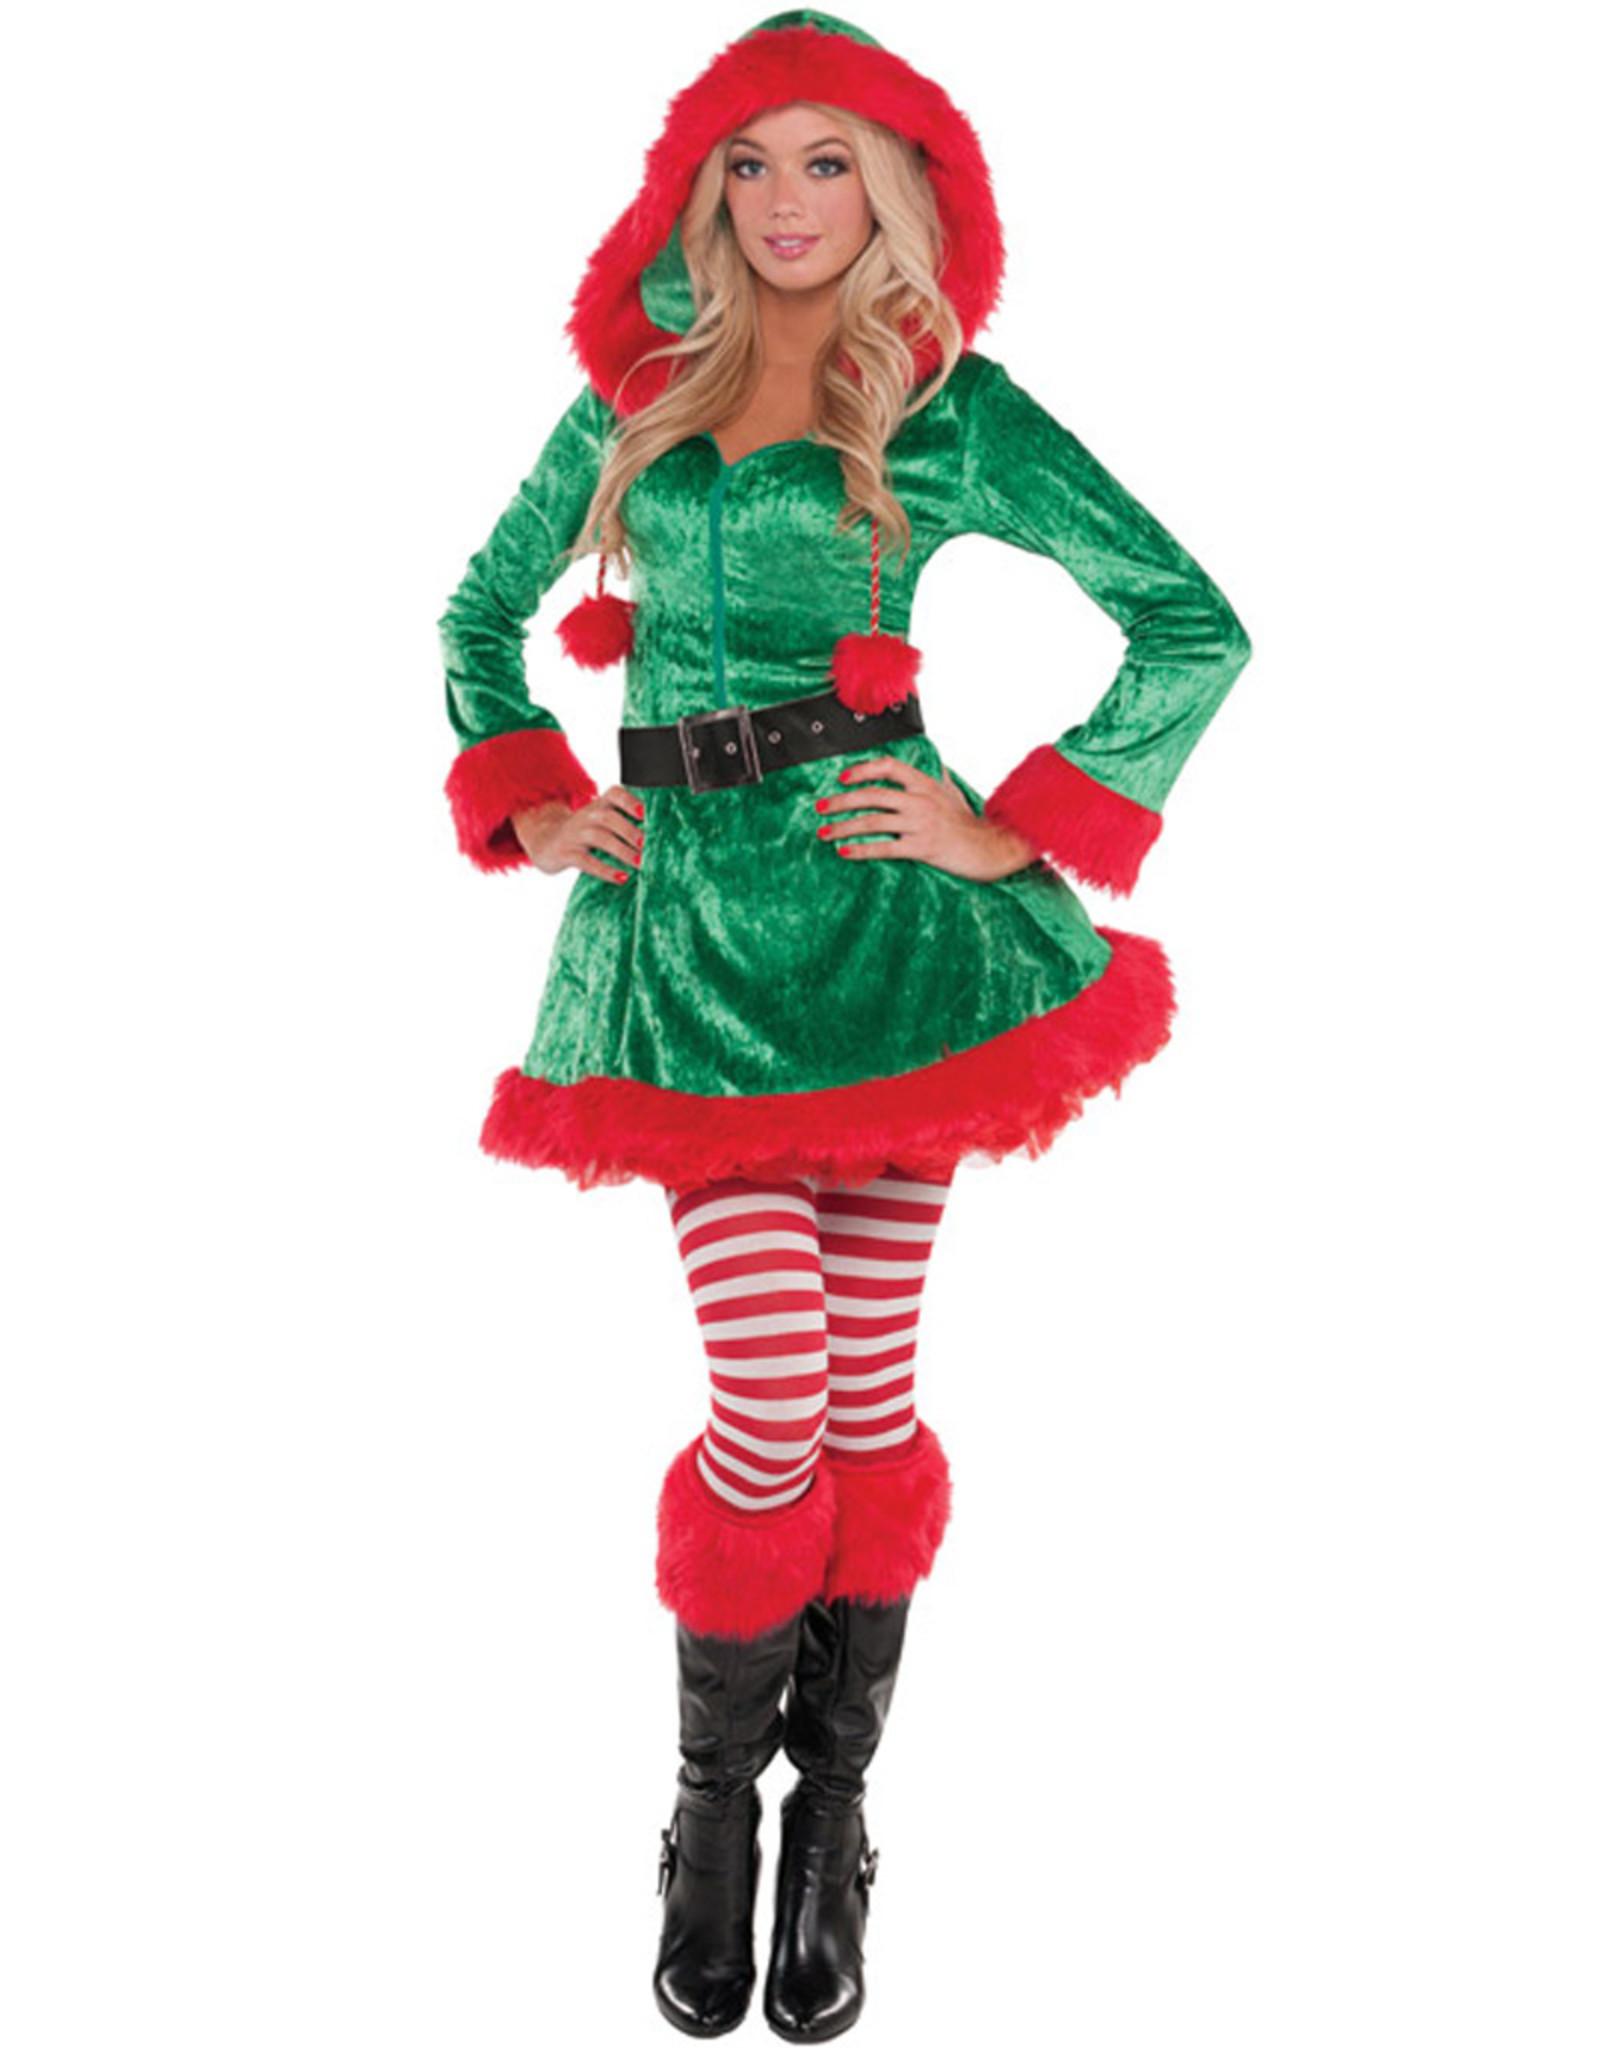 Sassy Elf Costume - Women's